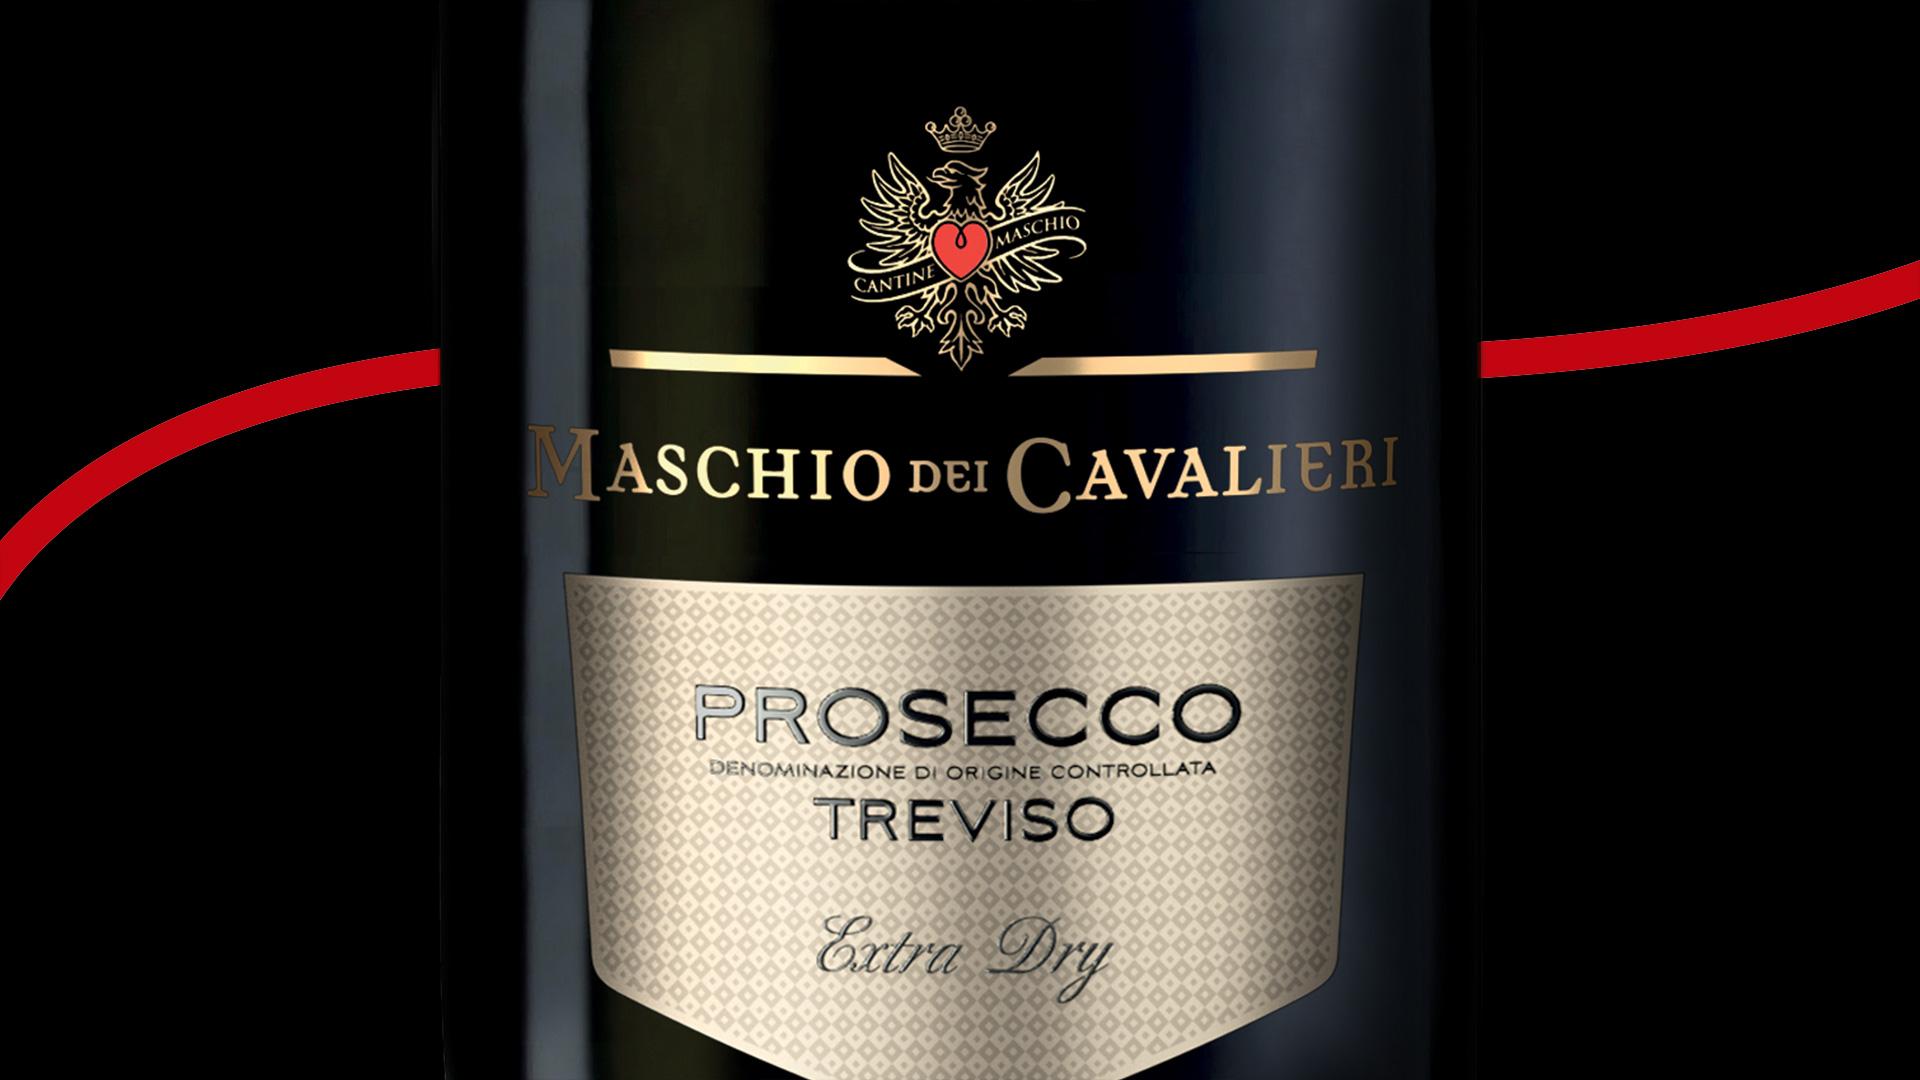 Maschio-Dei-Cavalieri-Rba-Design-003